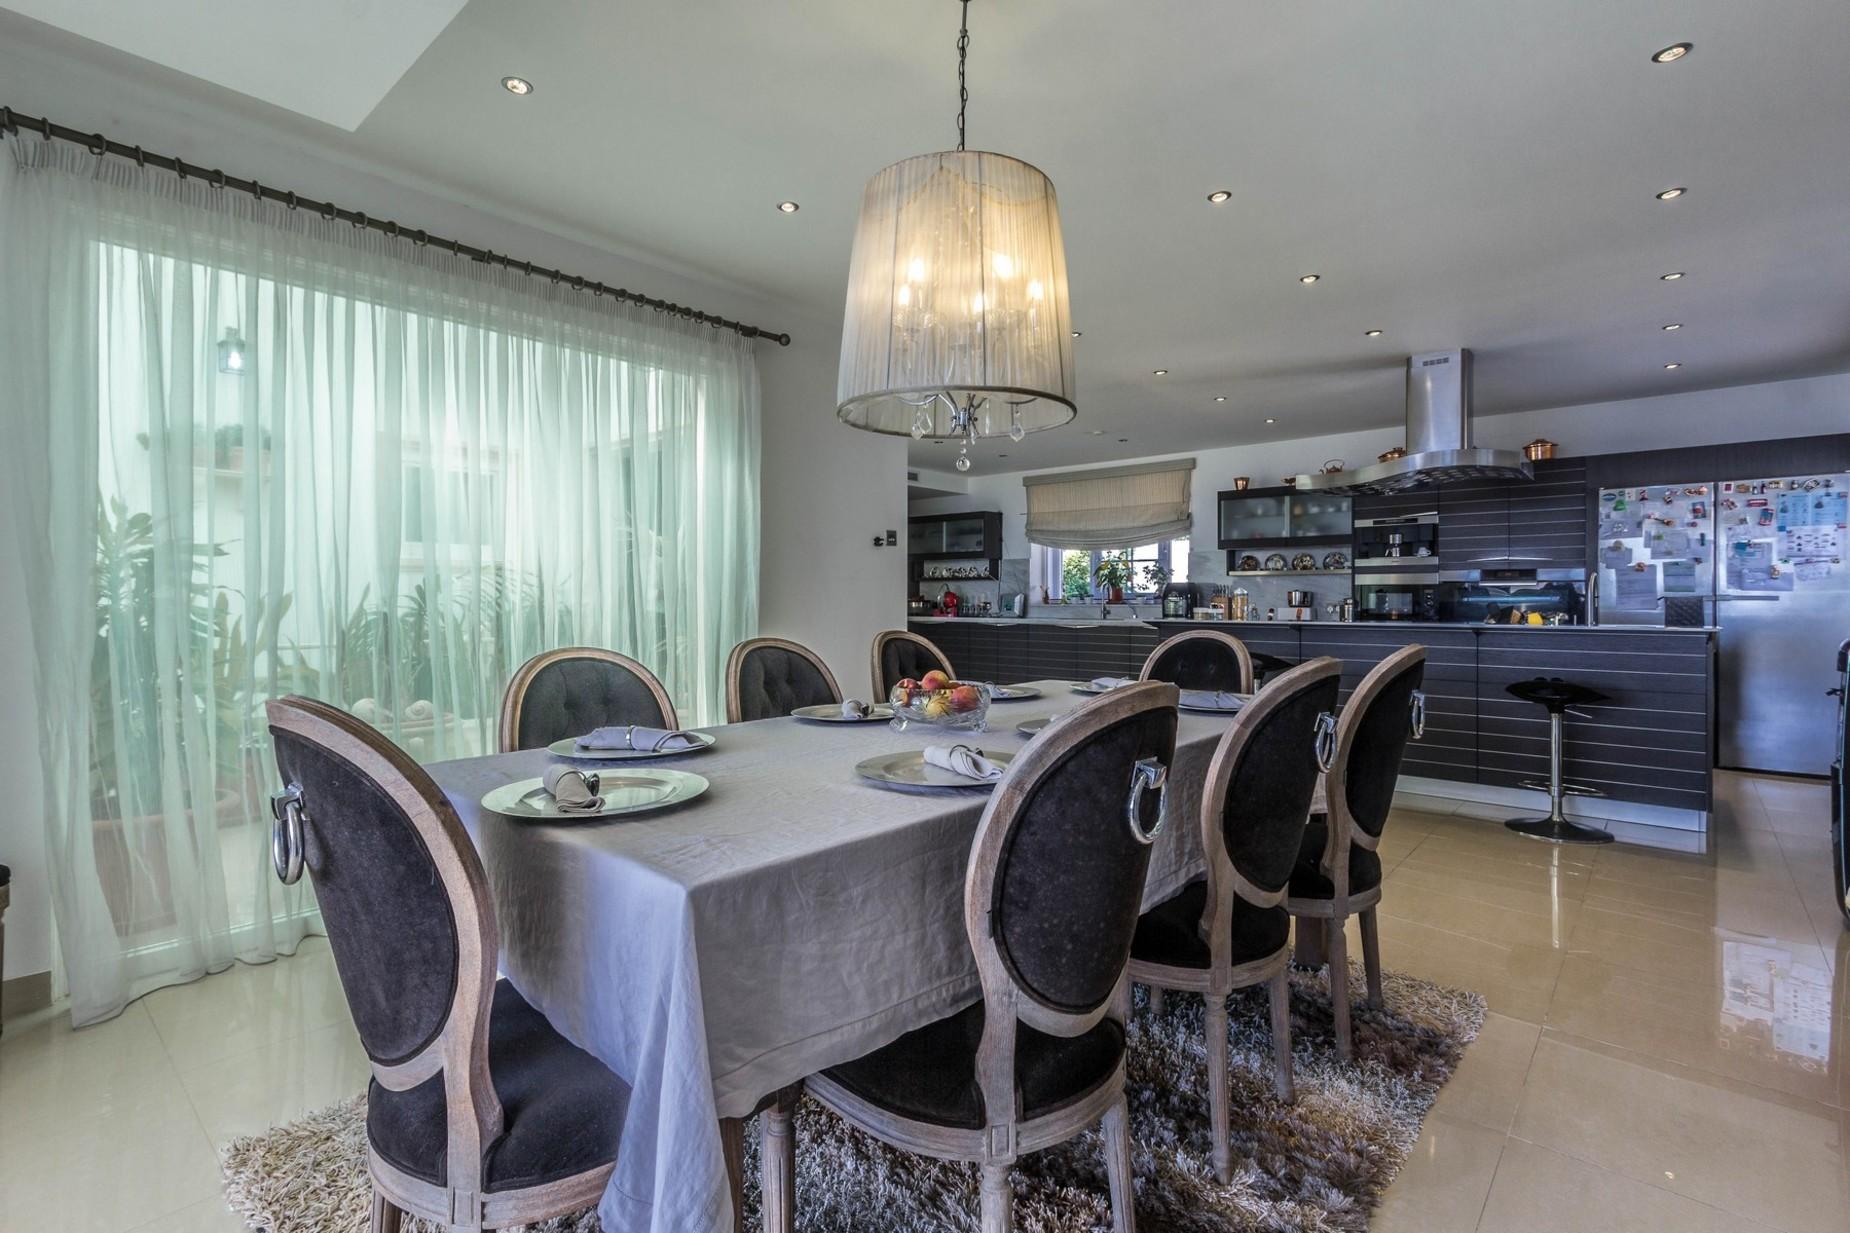 3 bed Villa For Sale in Marsascala, Marsascala - thumb 8